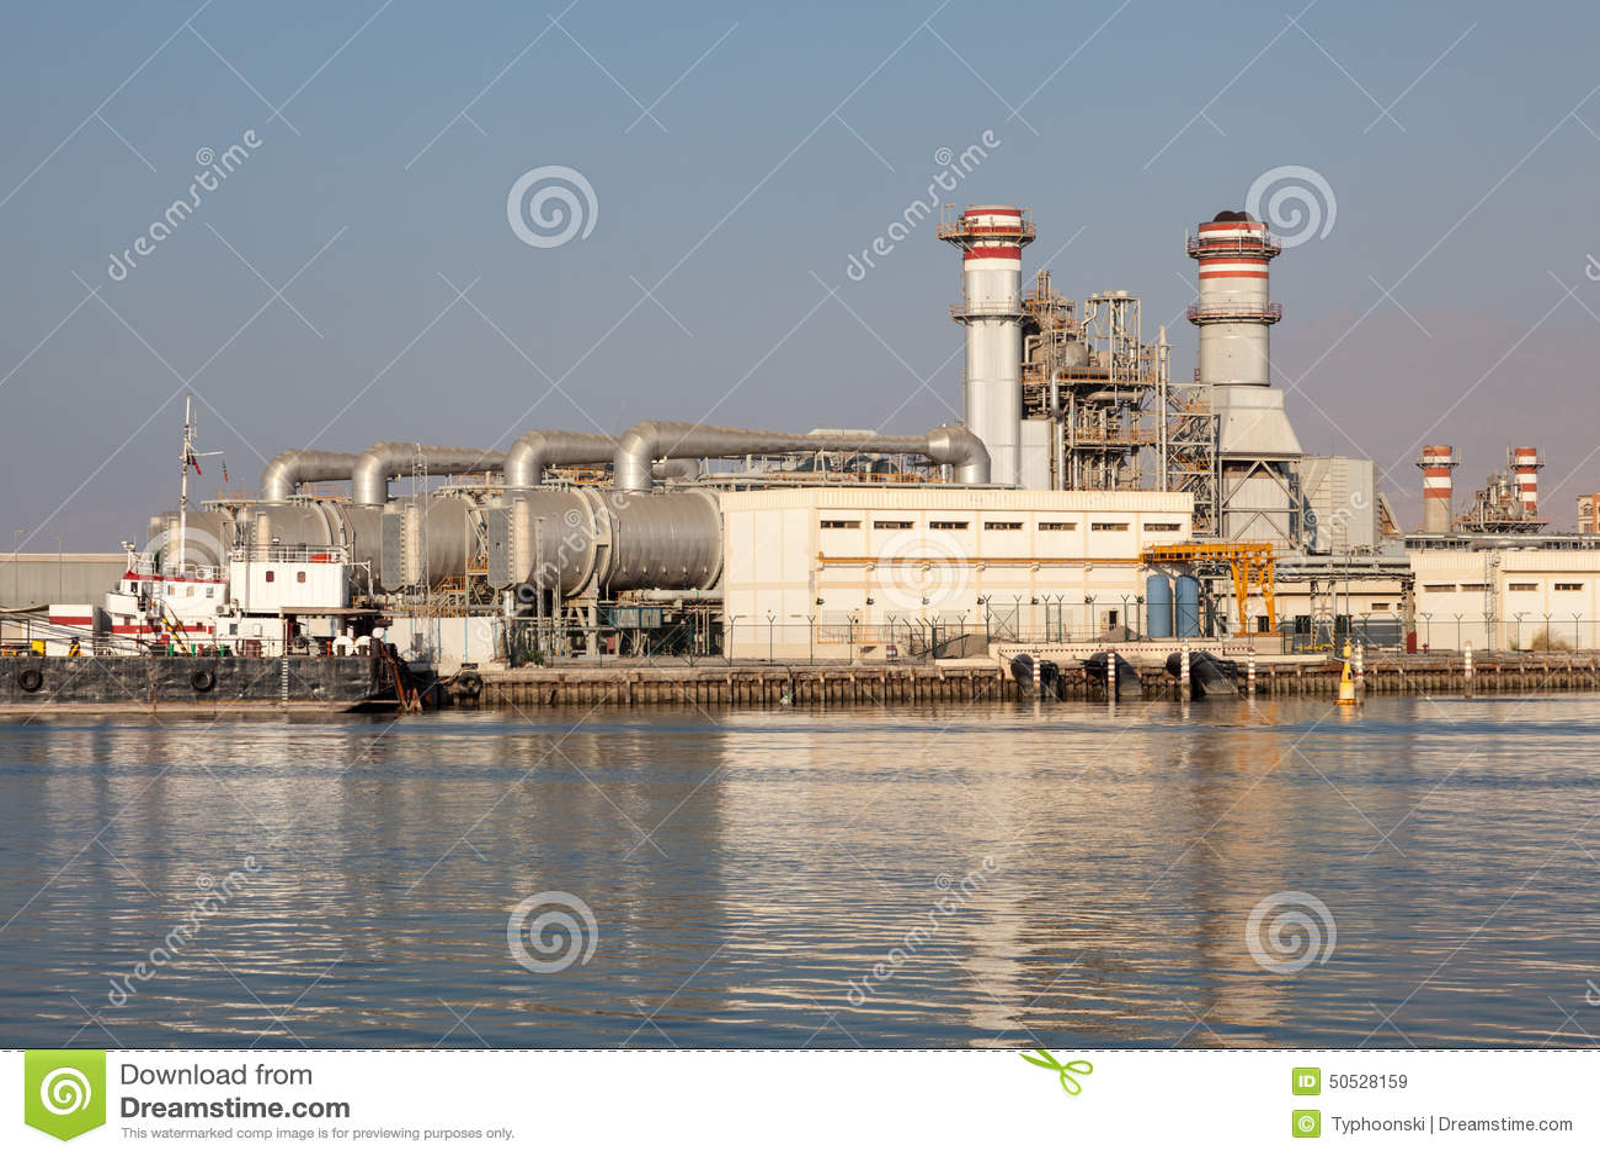 Ras Al Khaimah United Arab Emirates  City pictures : Power station in Ras Al Khaimah, United Arab Emirates.